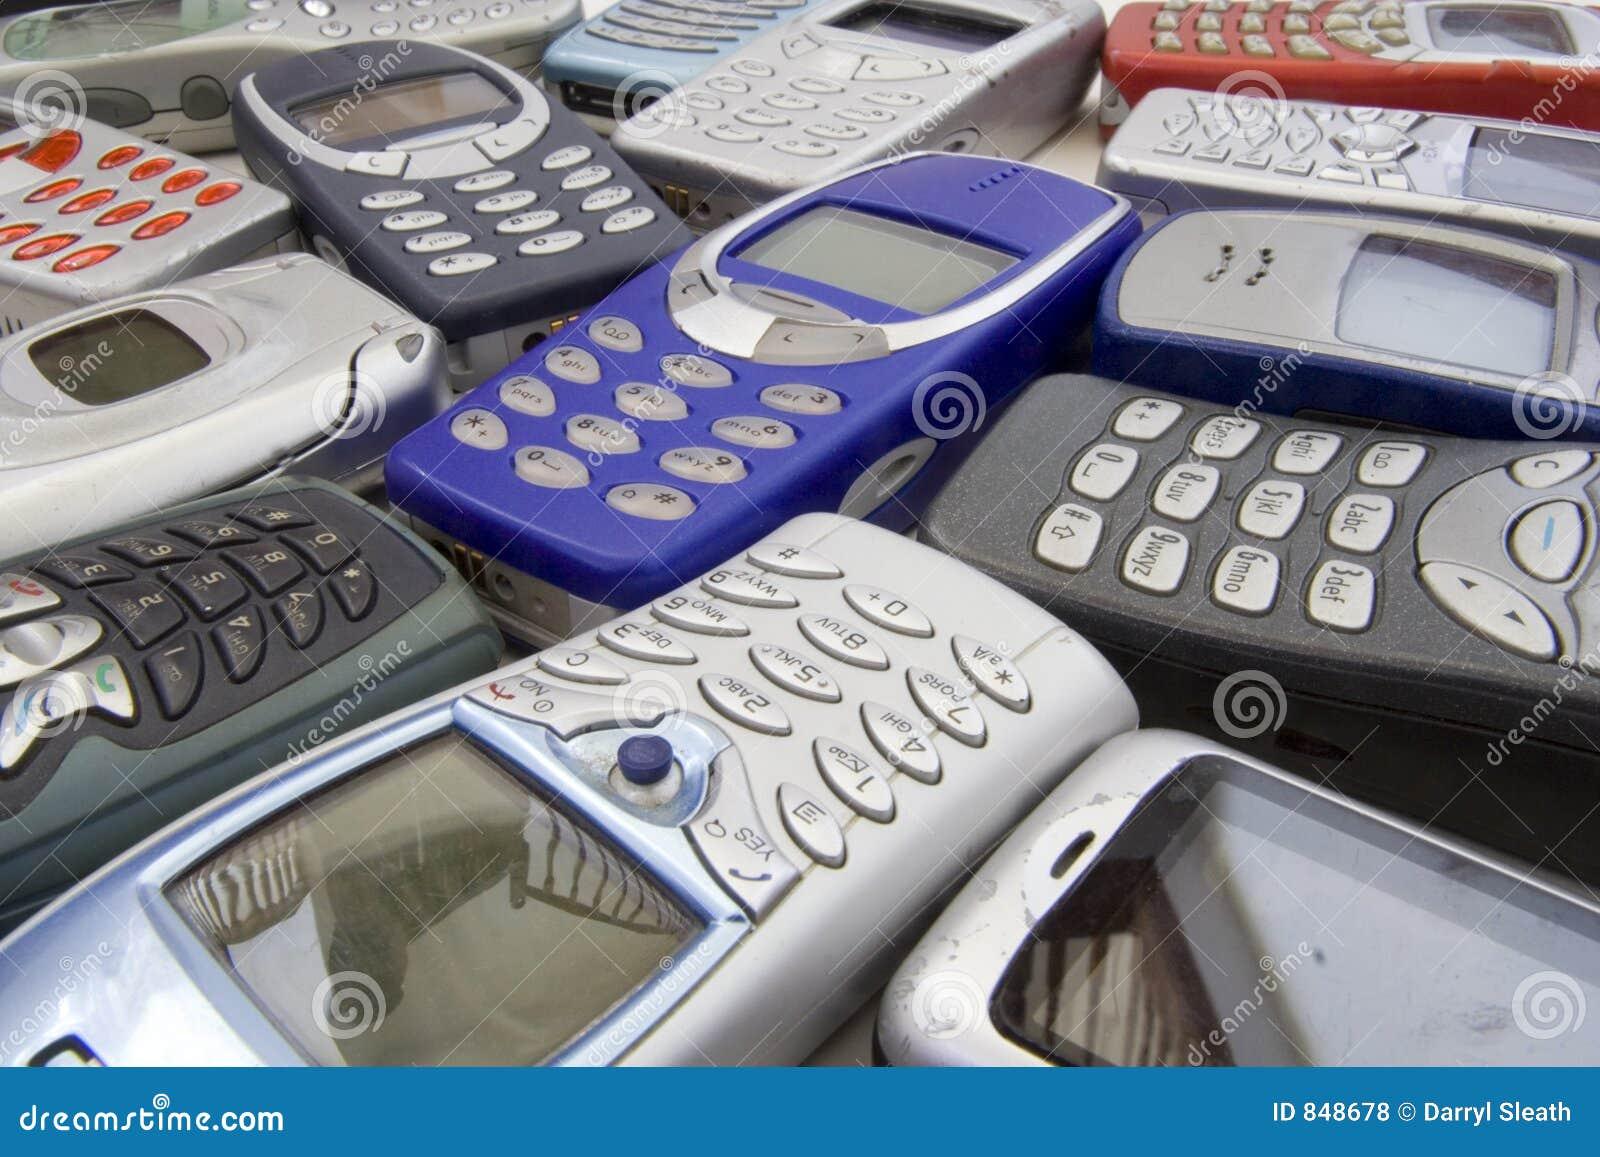 Old cellular phones 1